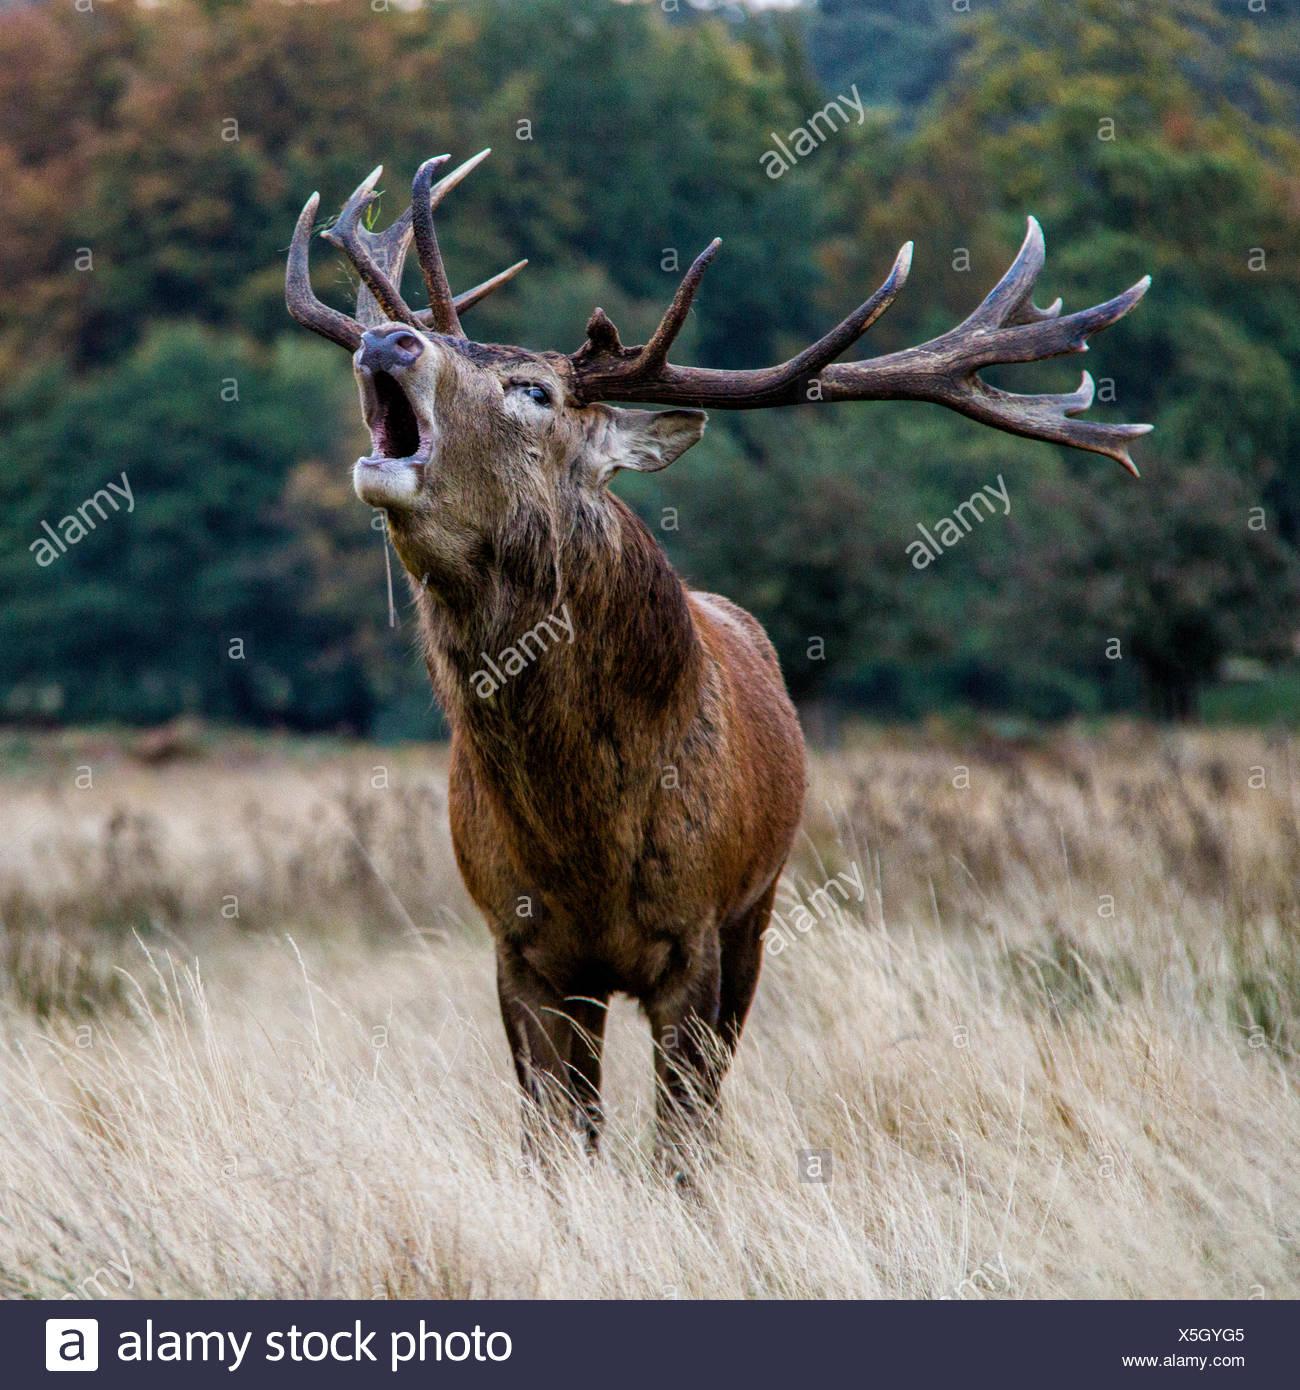 Stag bleating, Windsor Great Park, Berkshire, England, UK - Stock Image